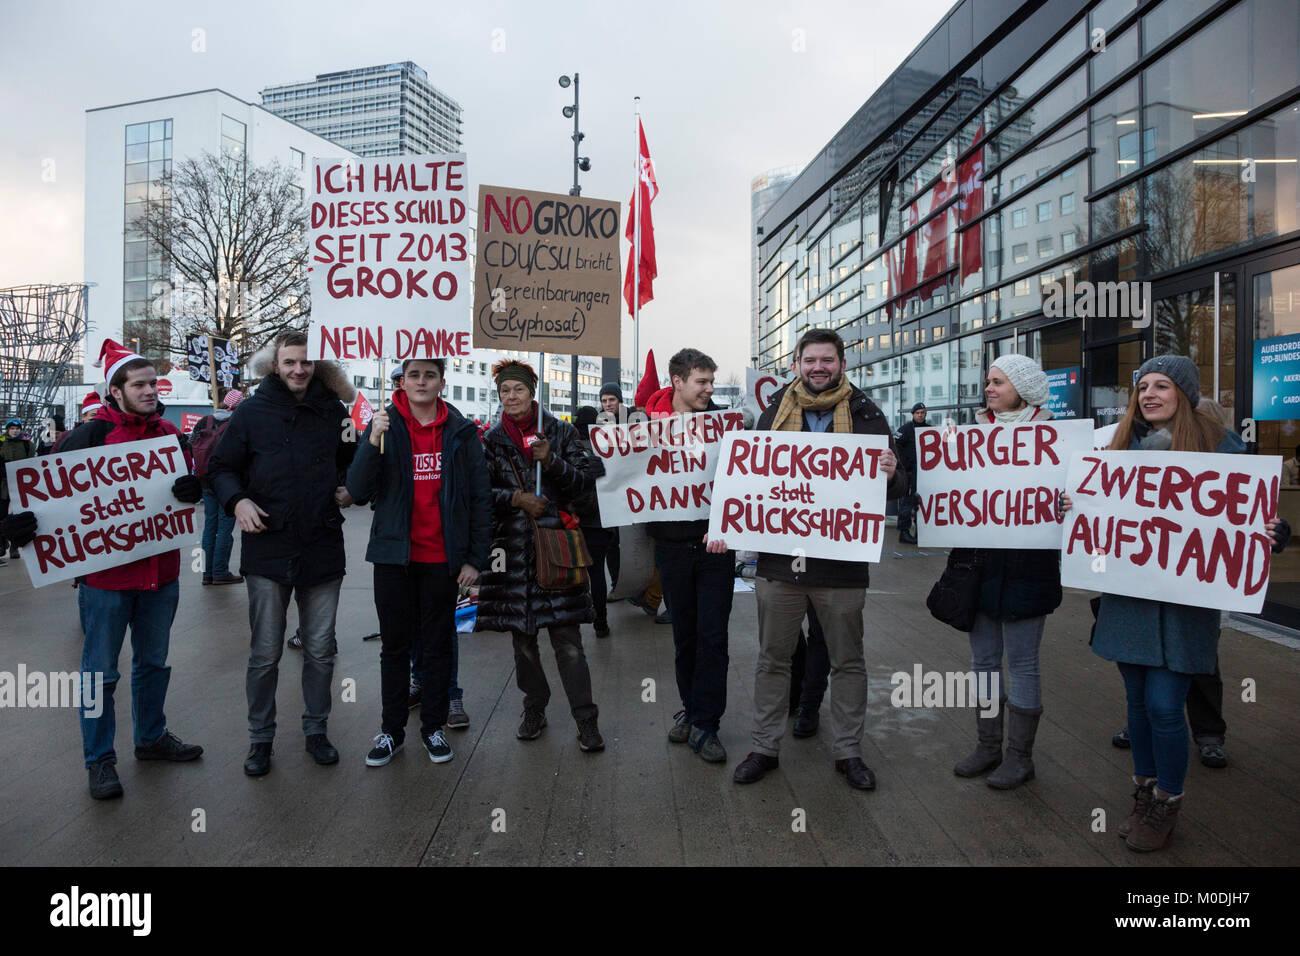 bonn-germany-21-january-2018-members-of-